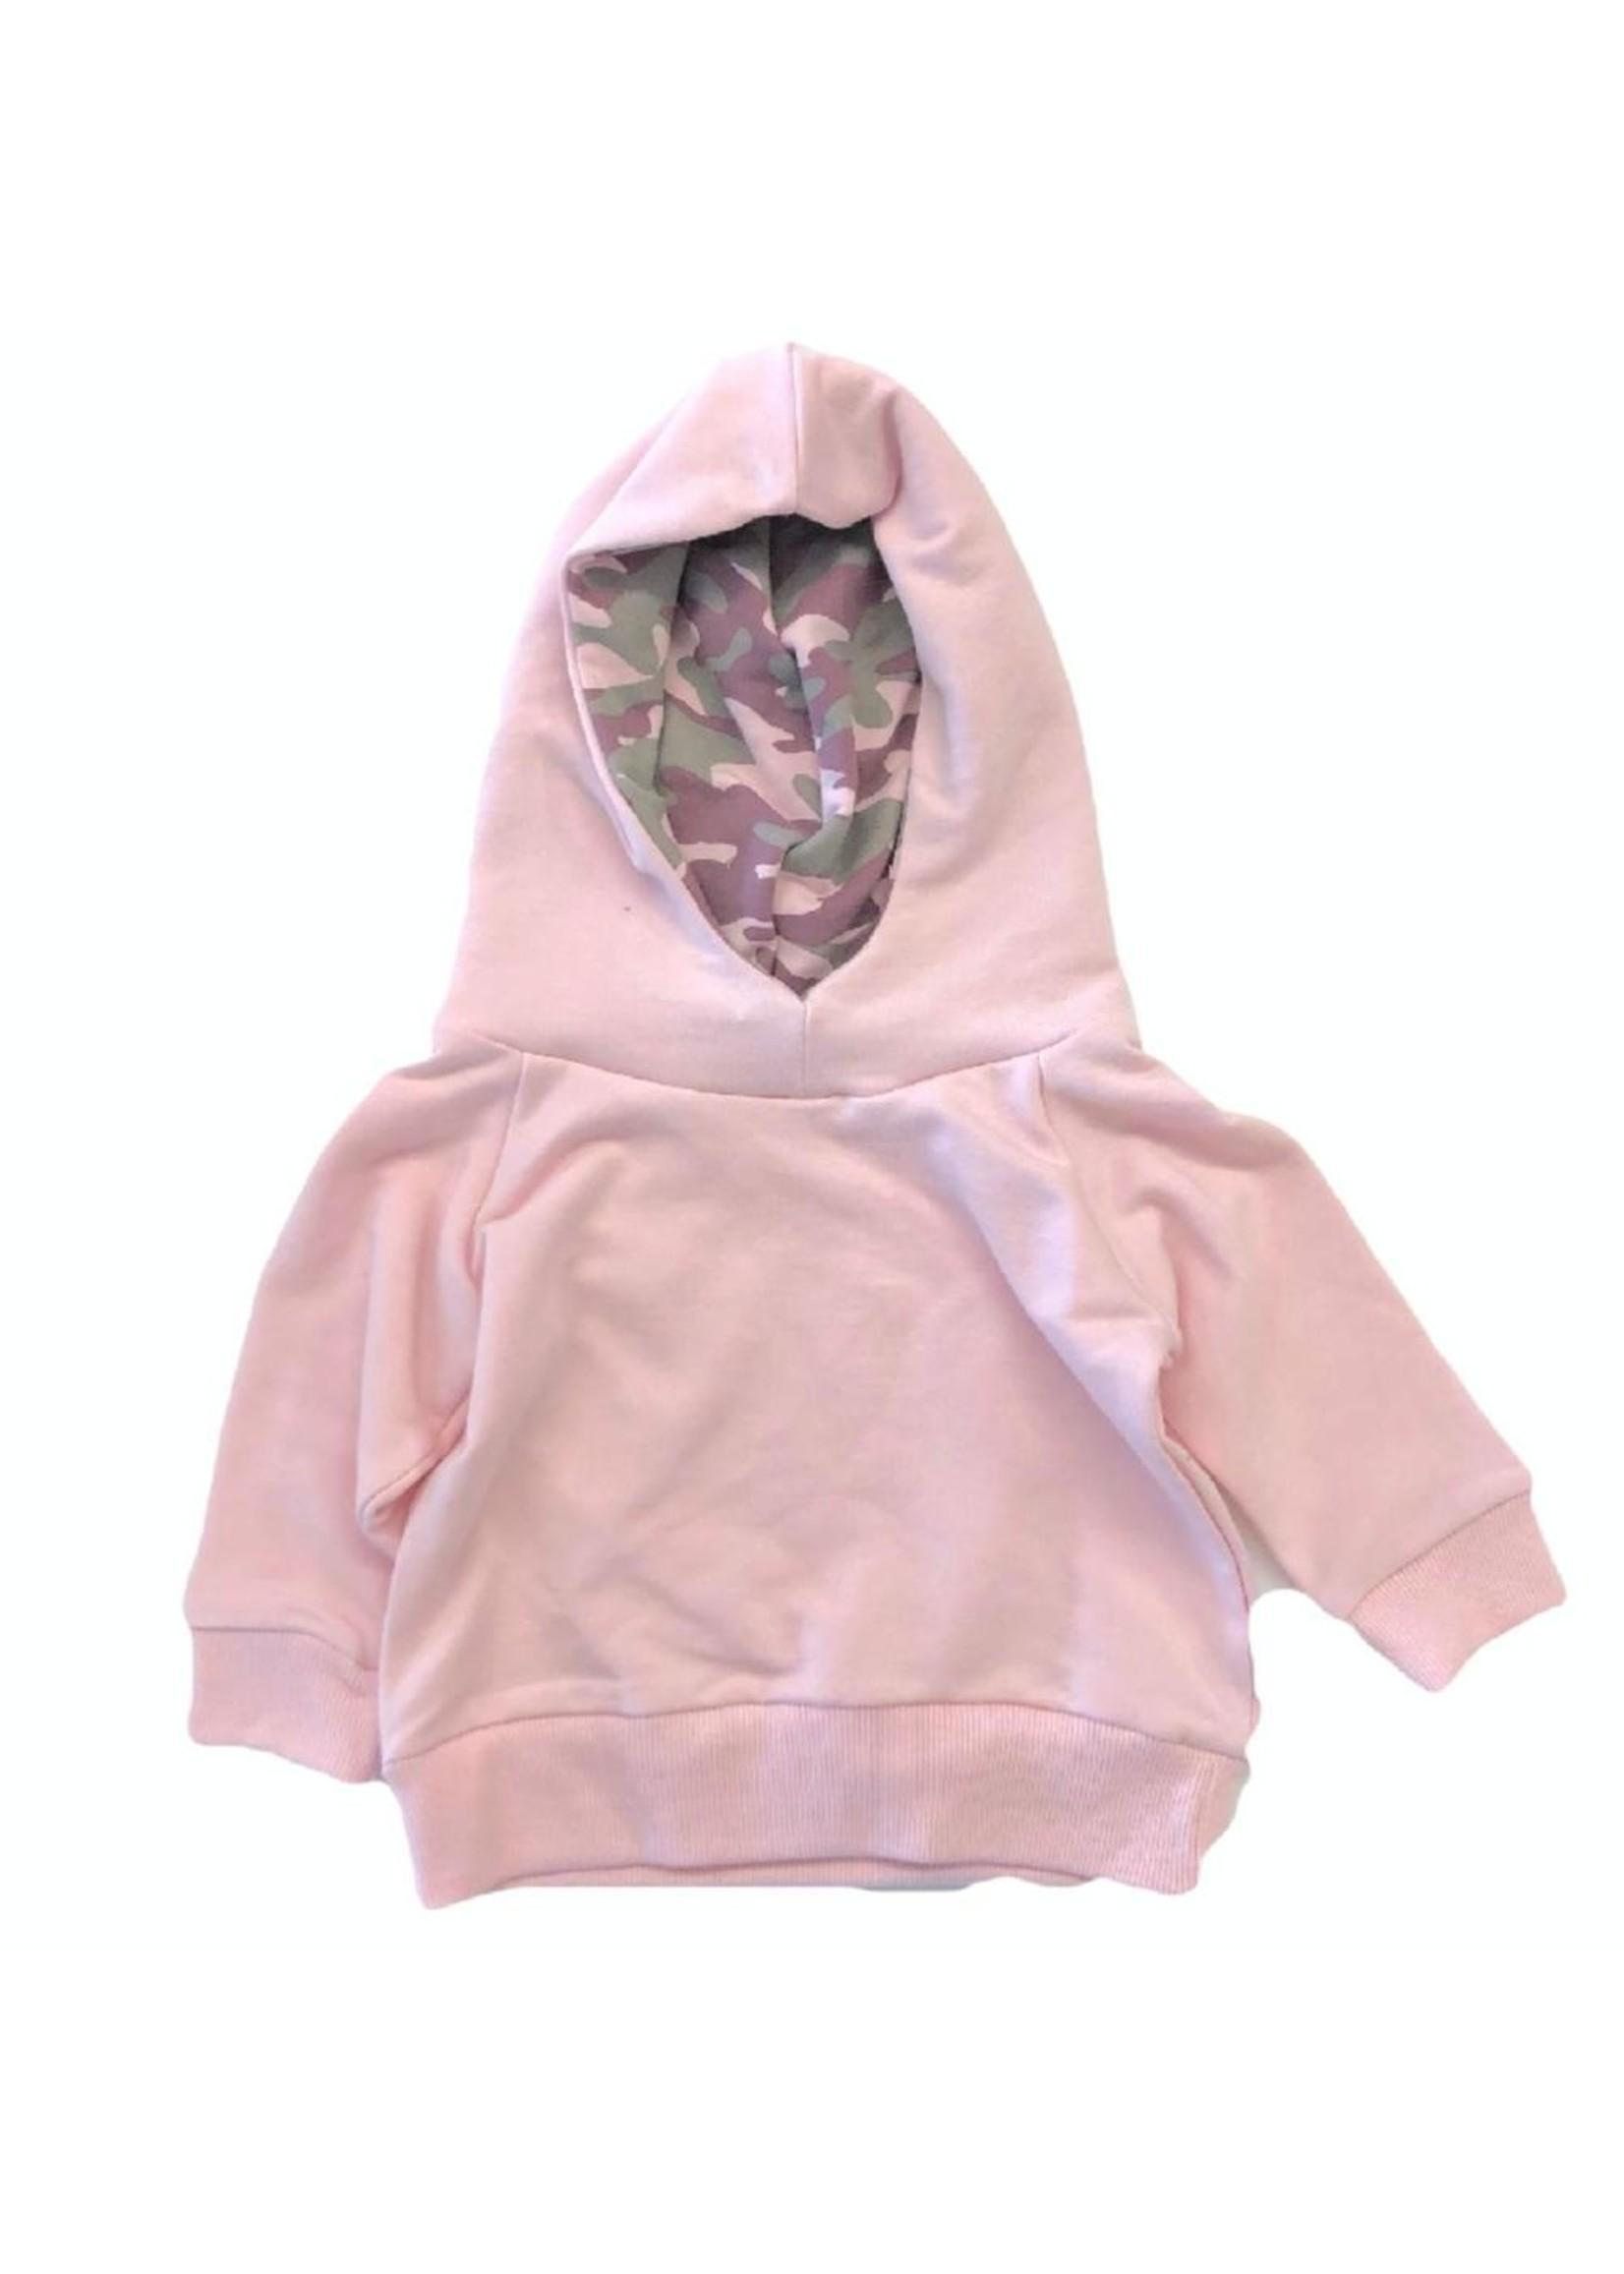 Portage and Main Pink Camo Hoodie - 6-12M